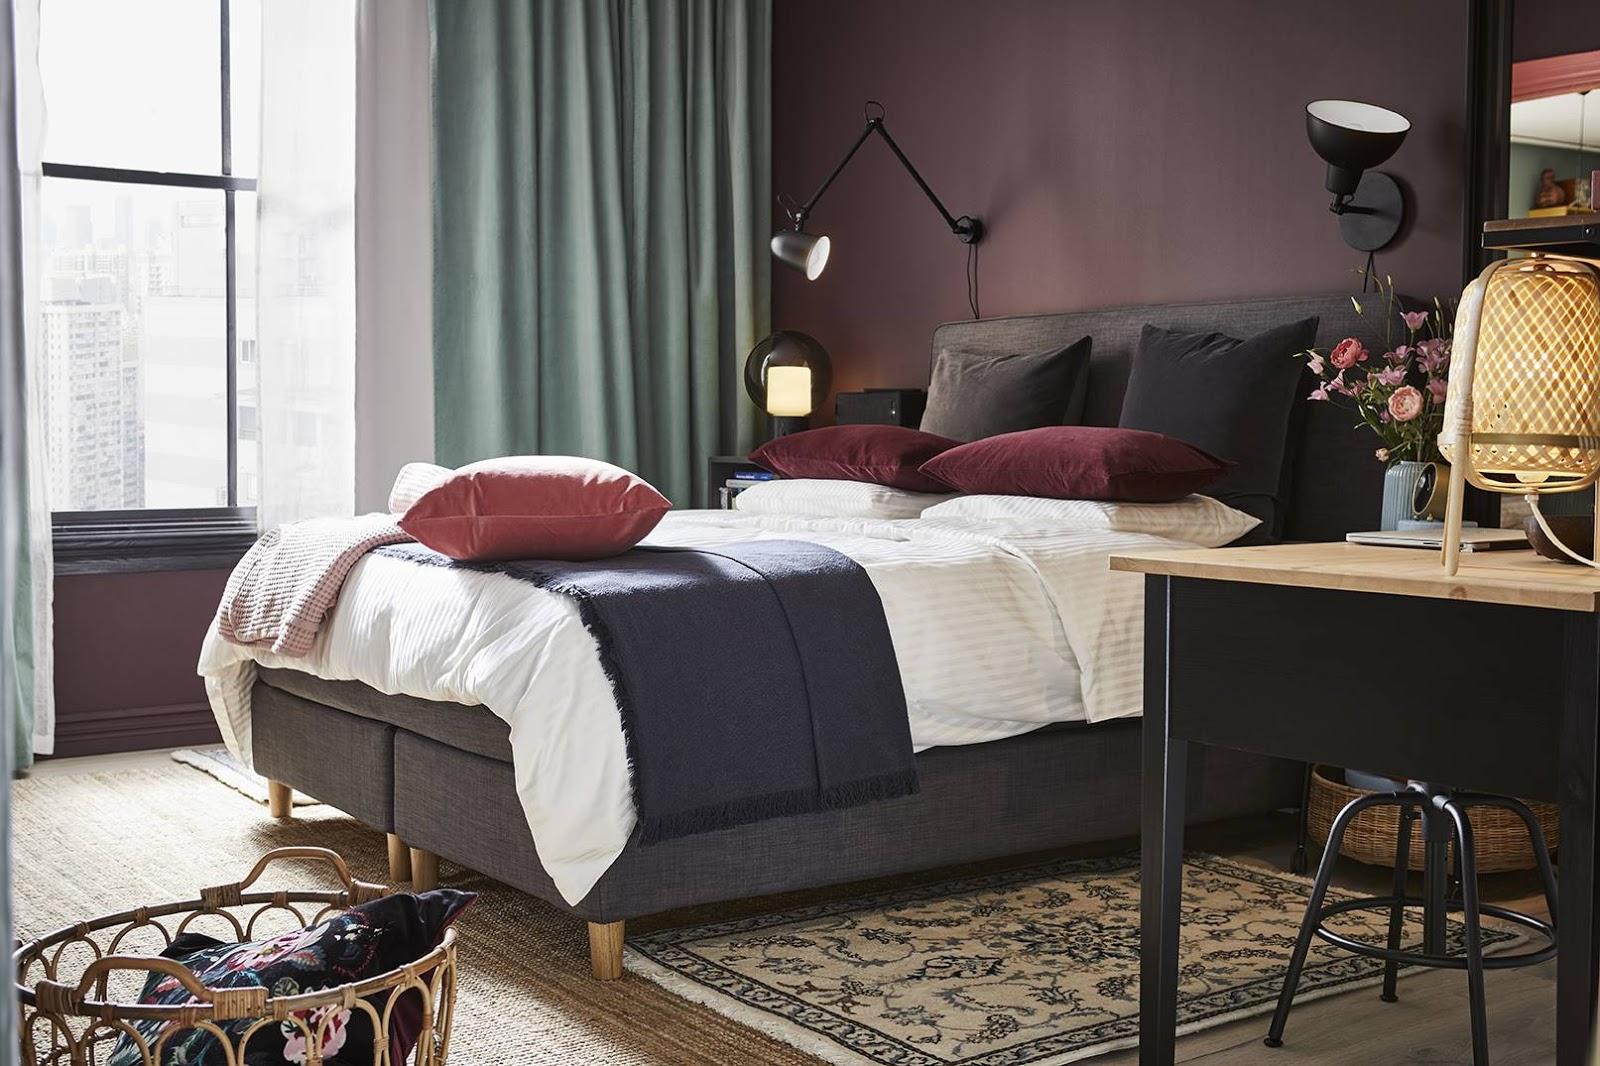 catalogo ikea 2020 dormitorio femenino decoración cortina verde